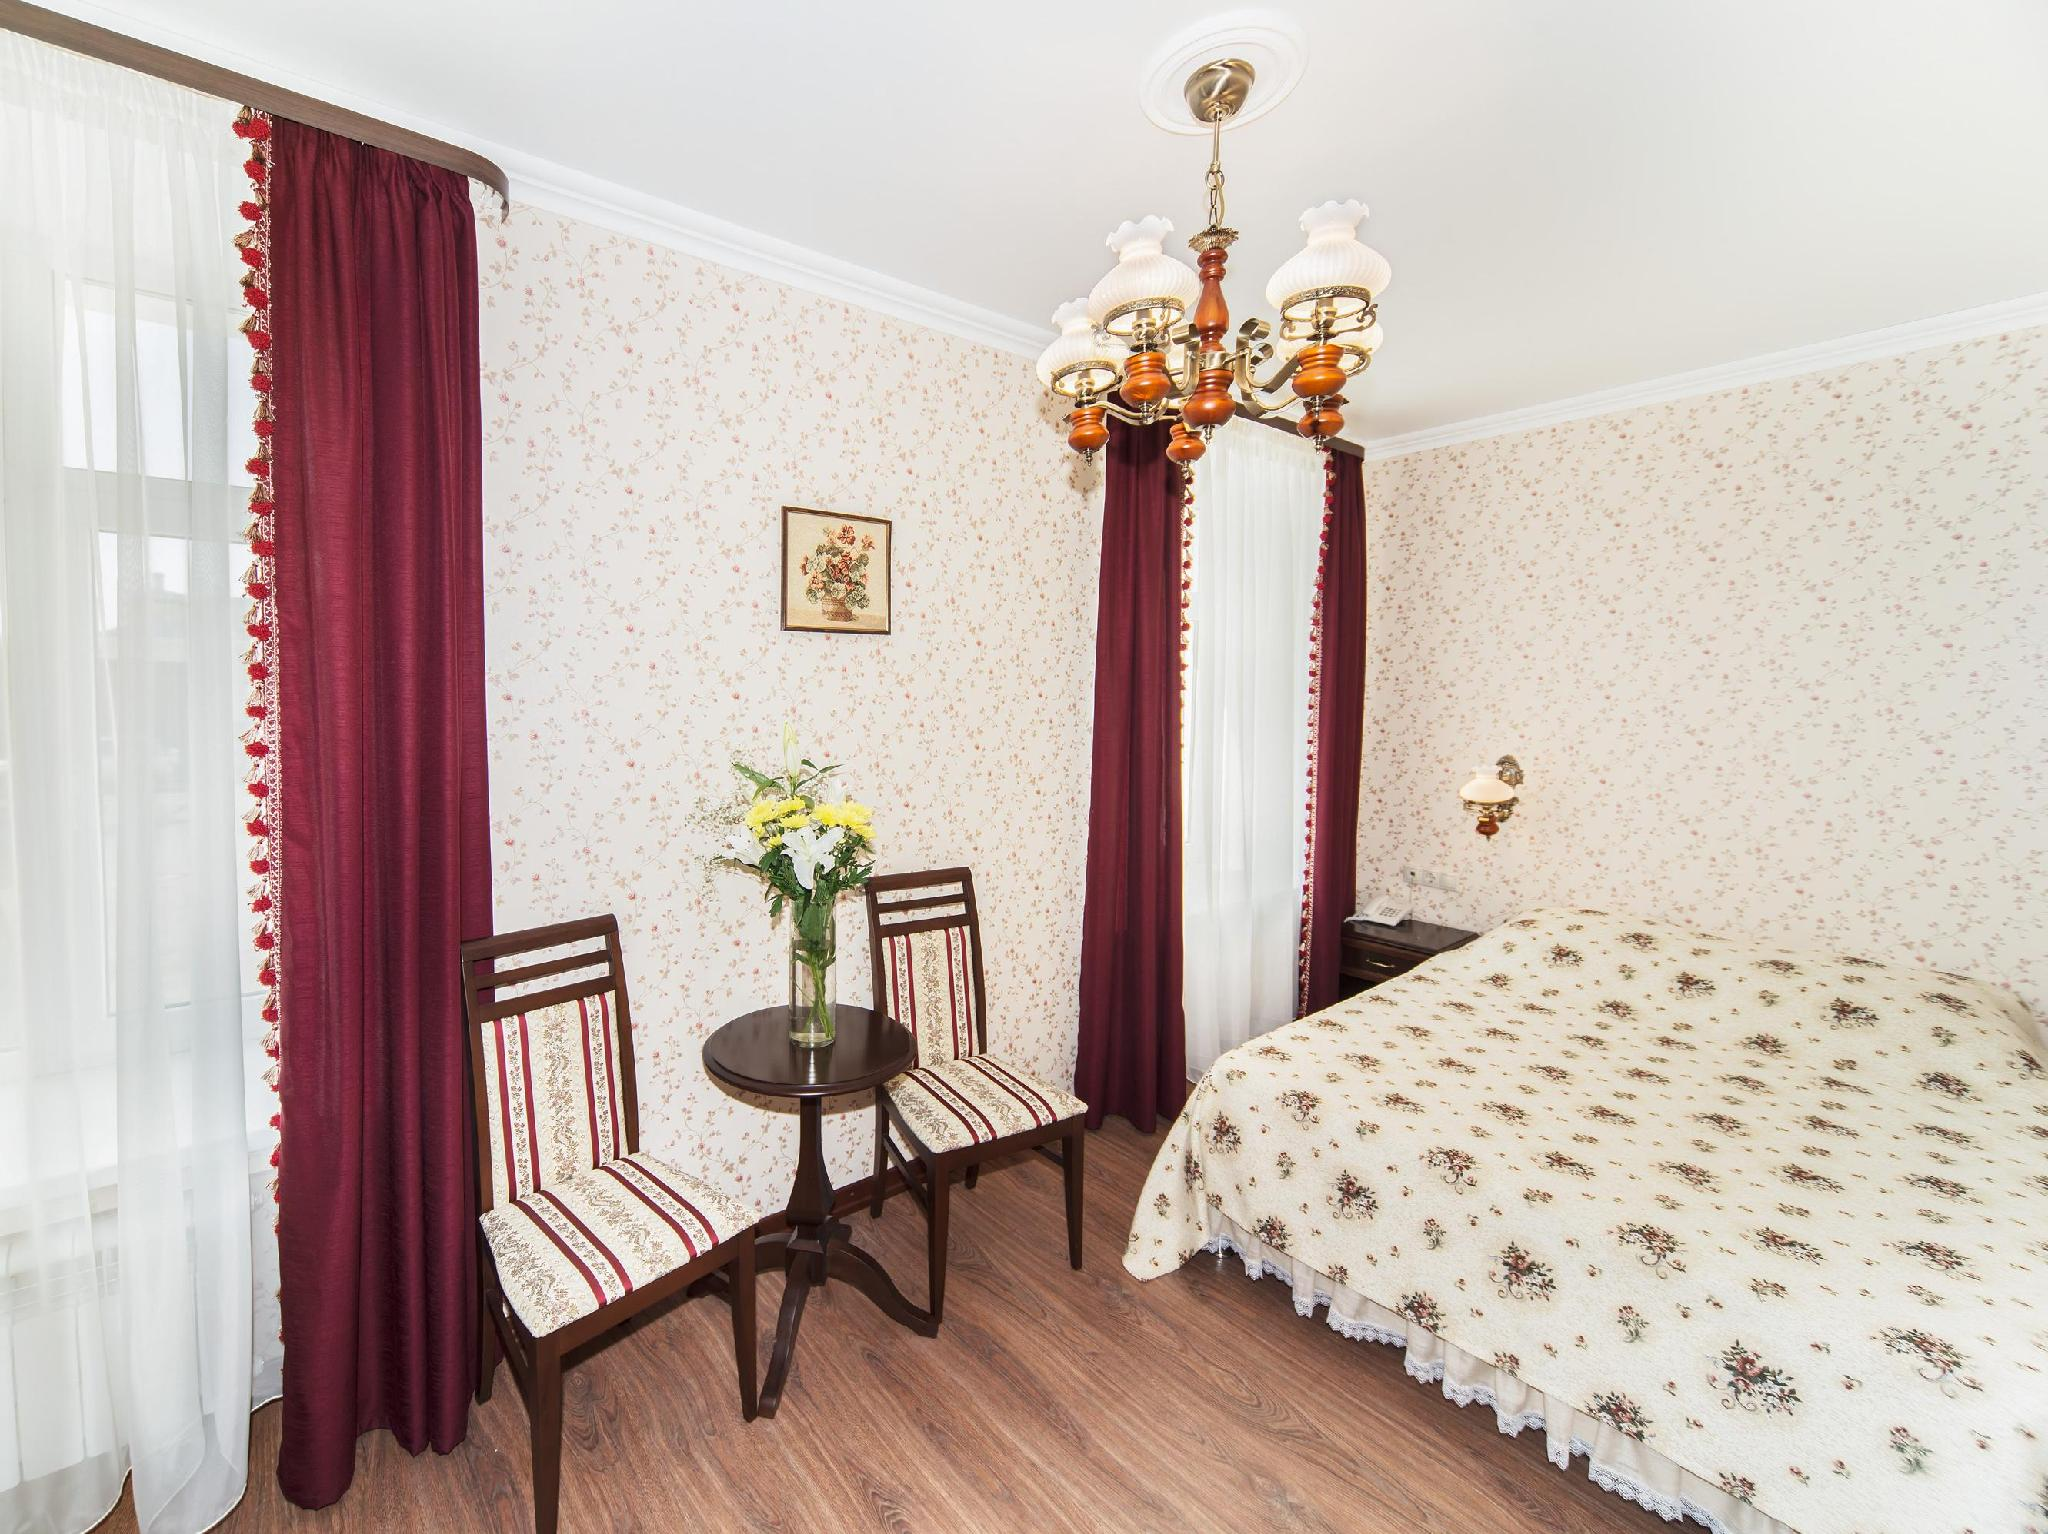 Sokol Hotel, Suzdal'skiy rayon